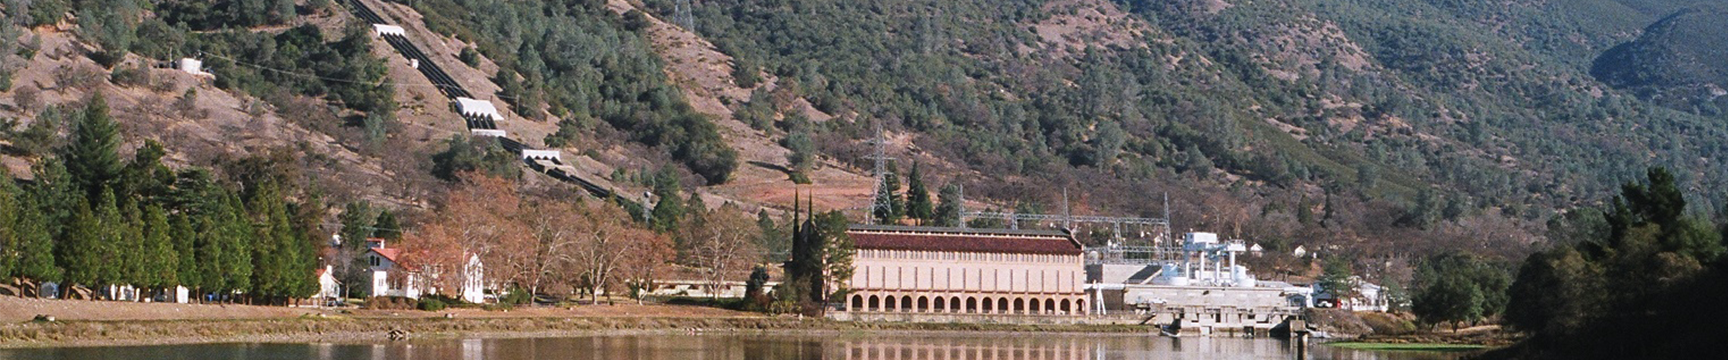 Moccasin Powerhouse